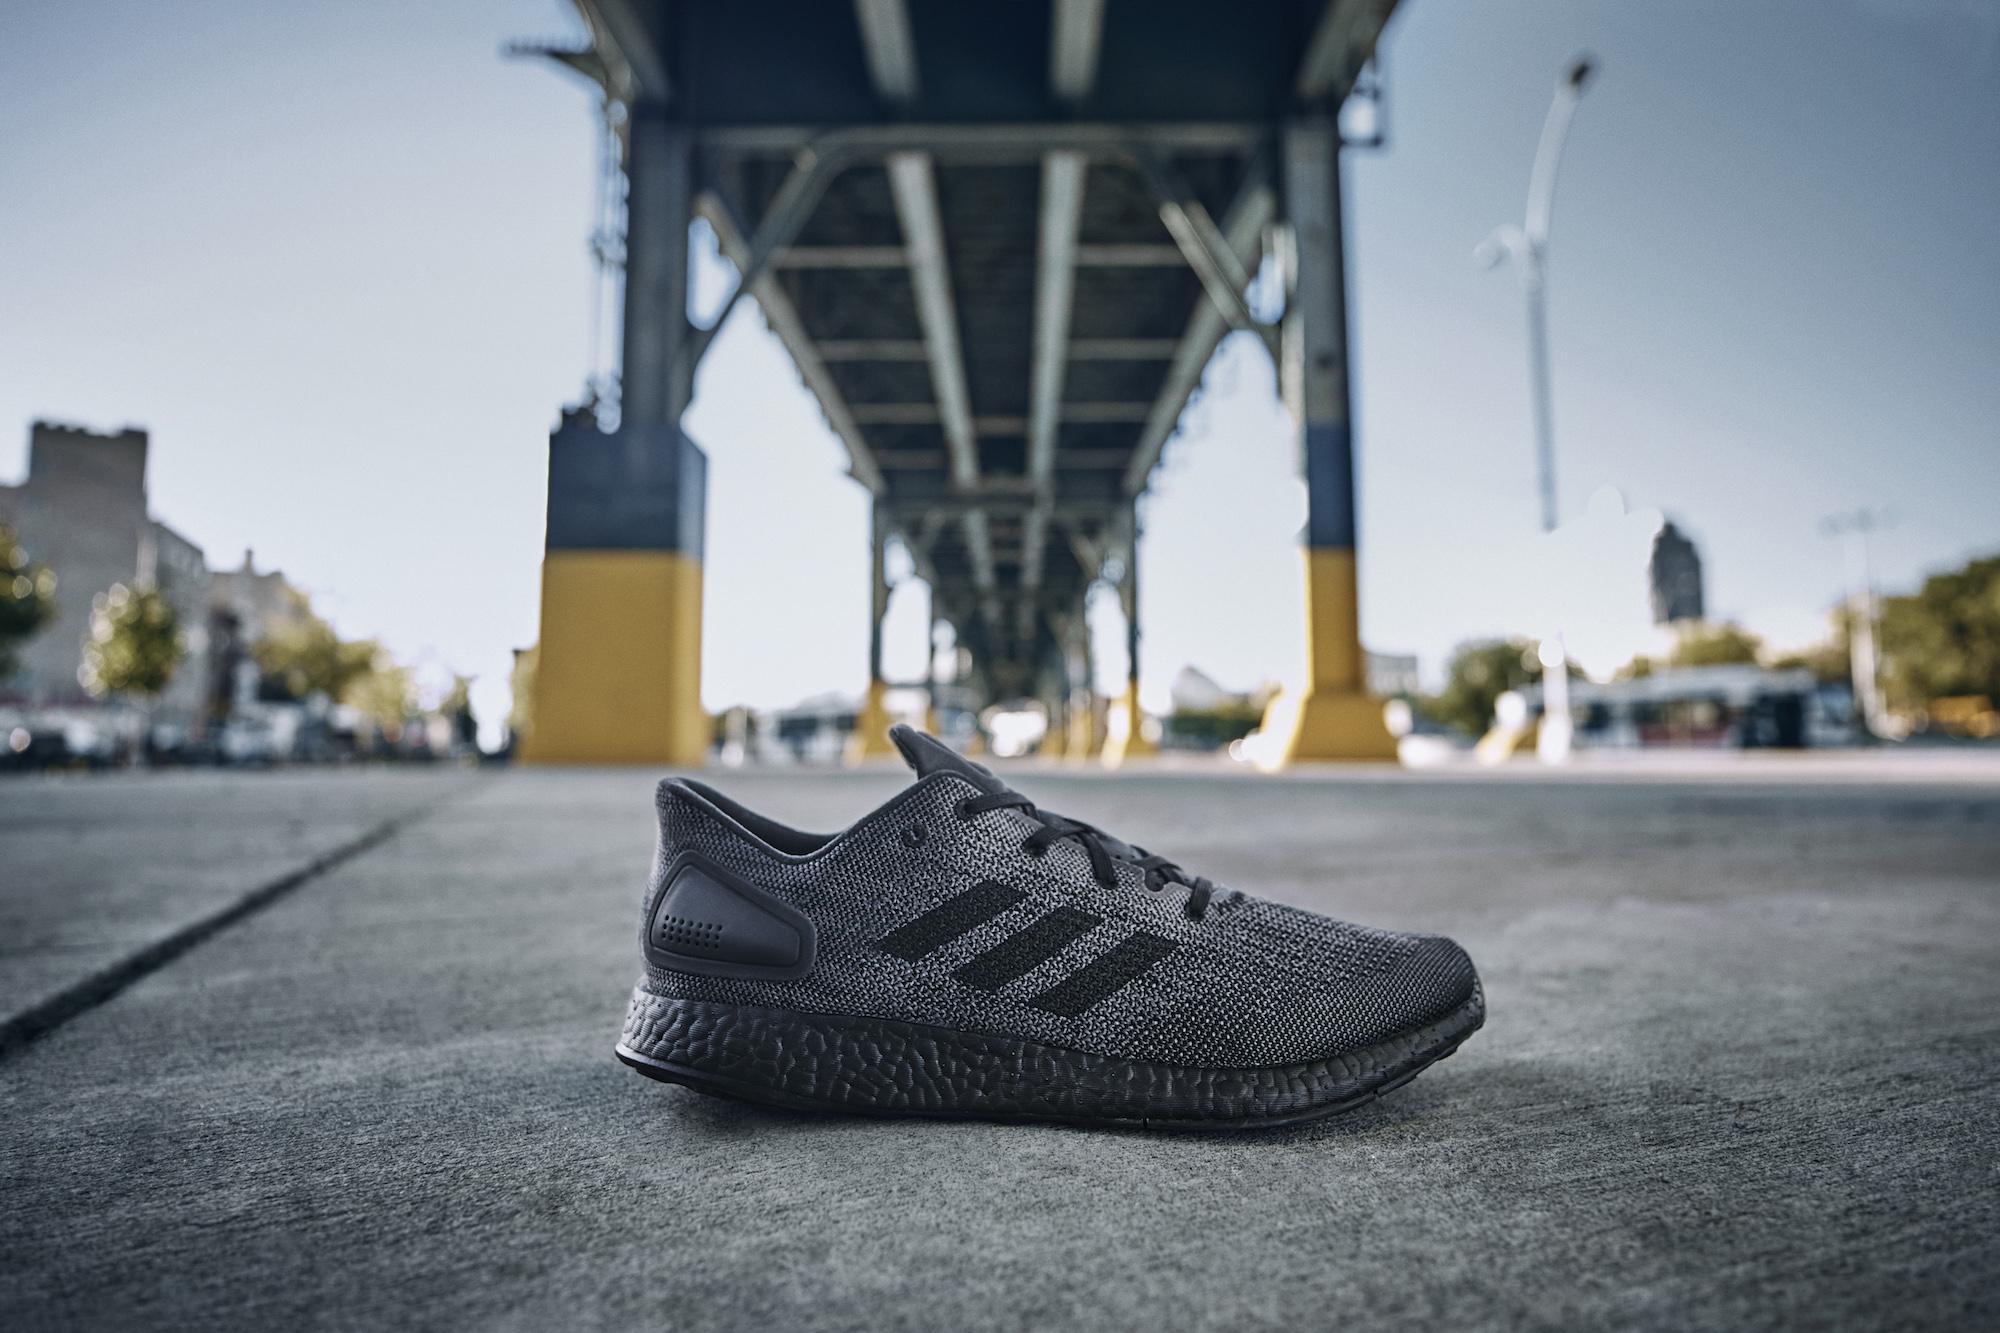 The adidas PureBoost DPR Triple Black